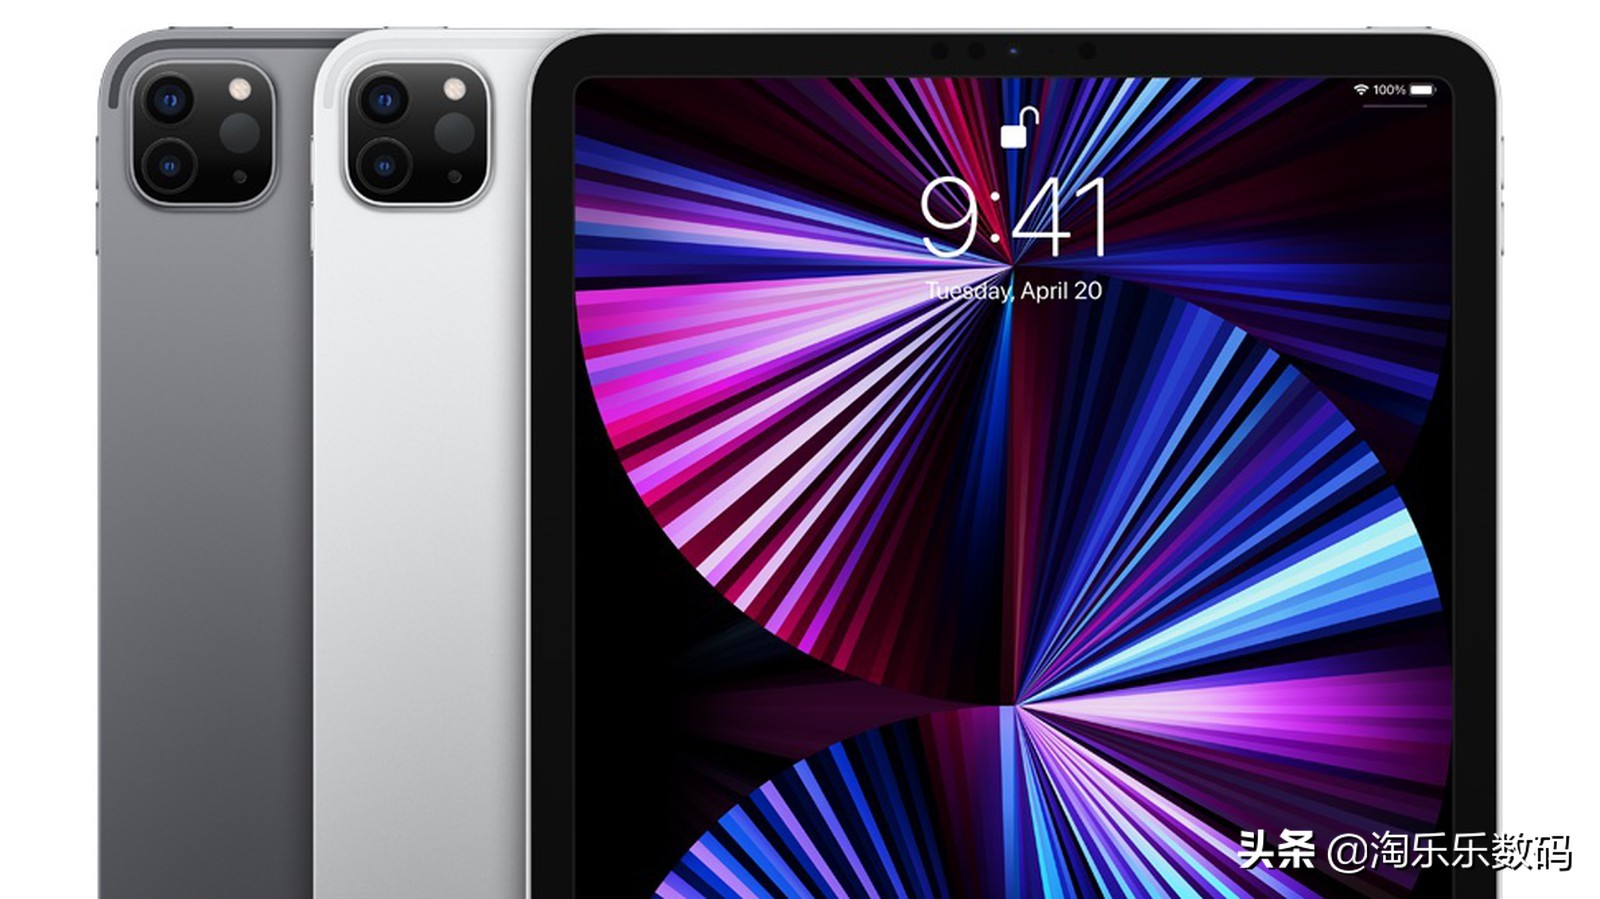 iPad Air 4与iPad Pro 2021对比差异区别在哪里?